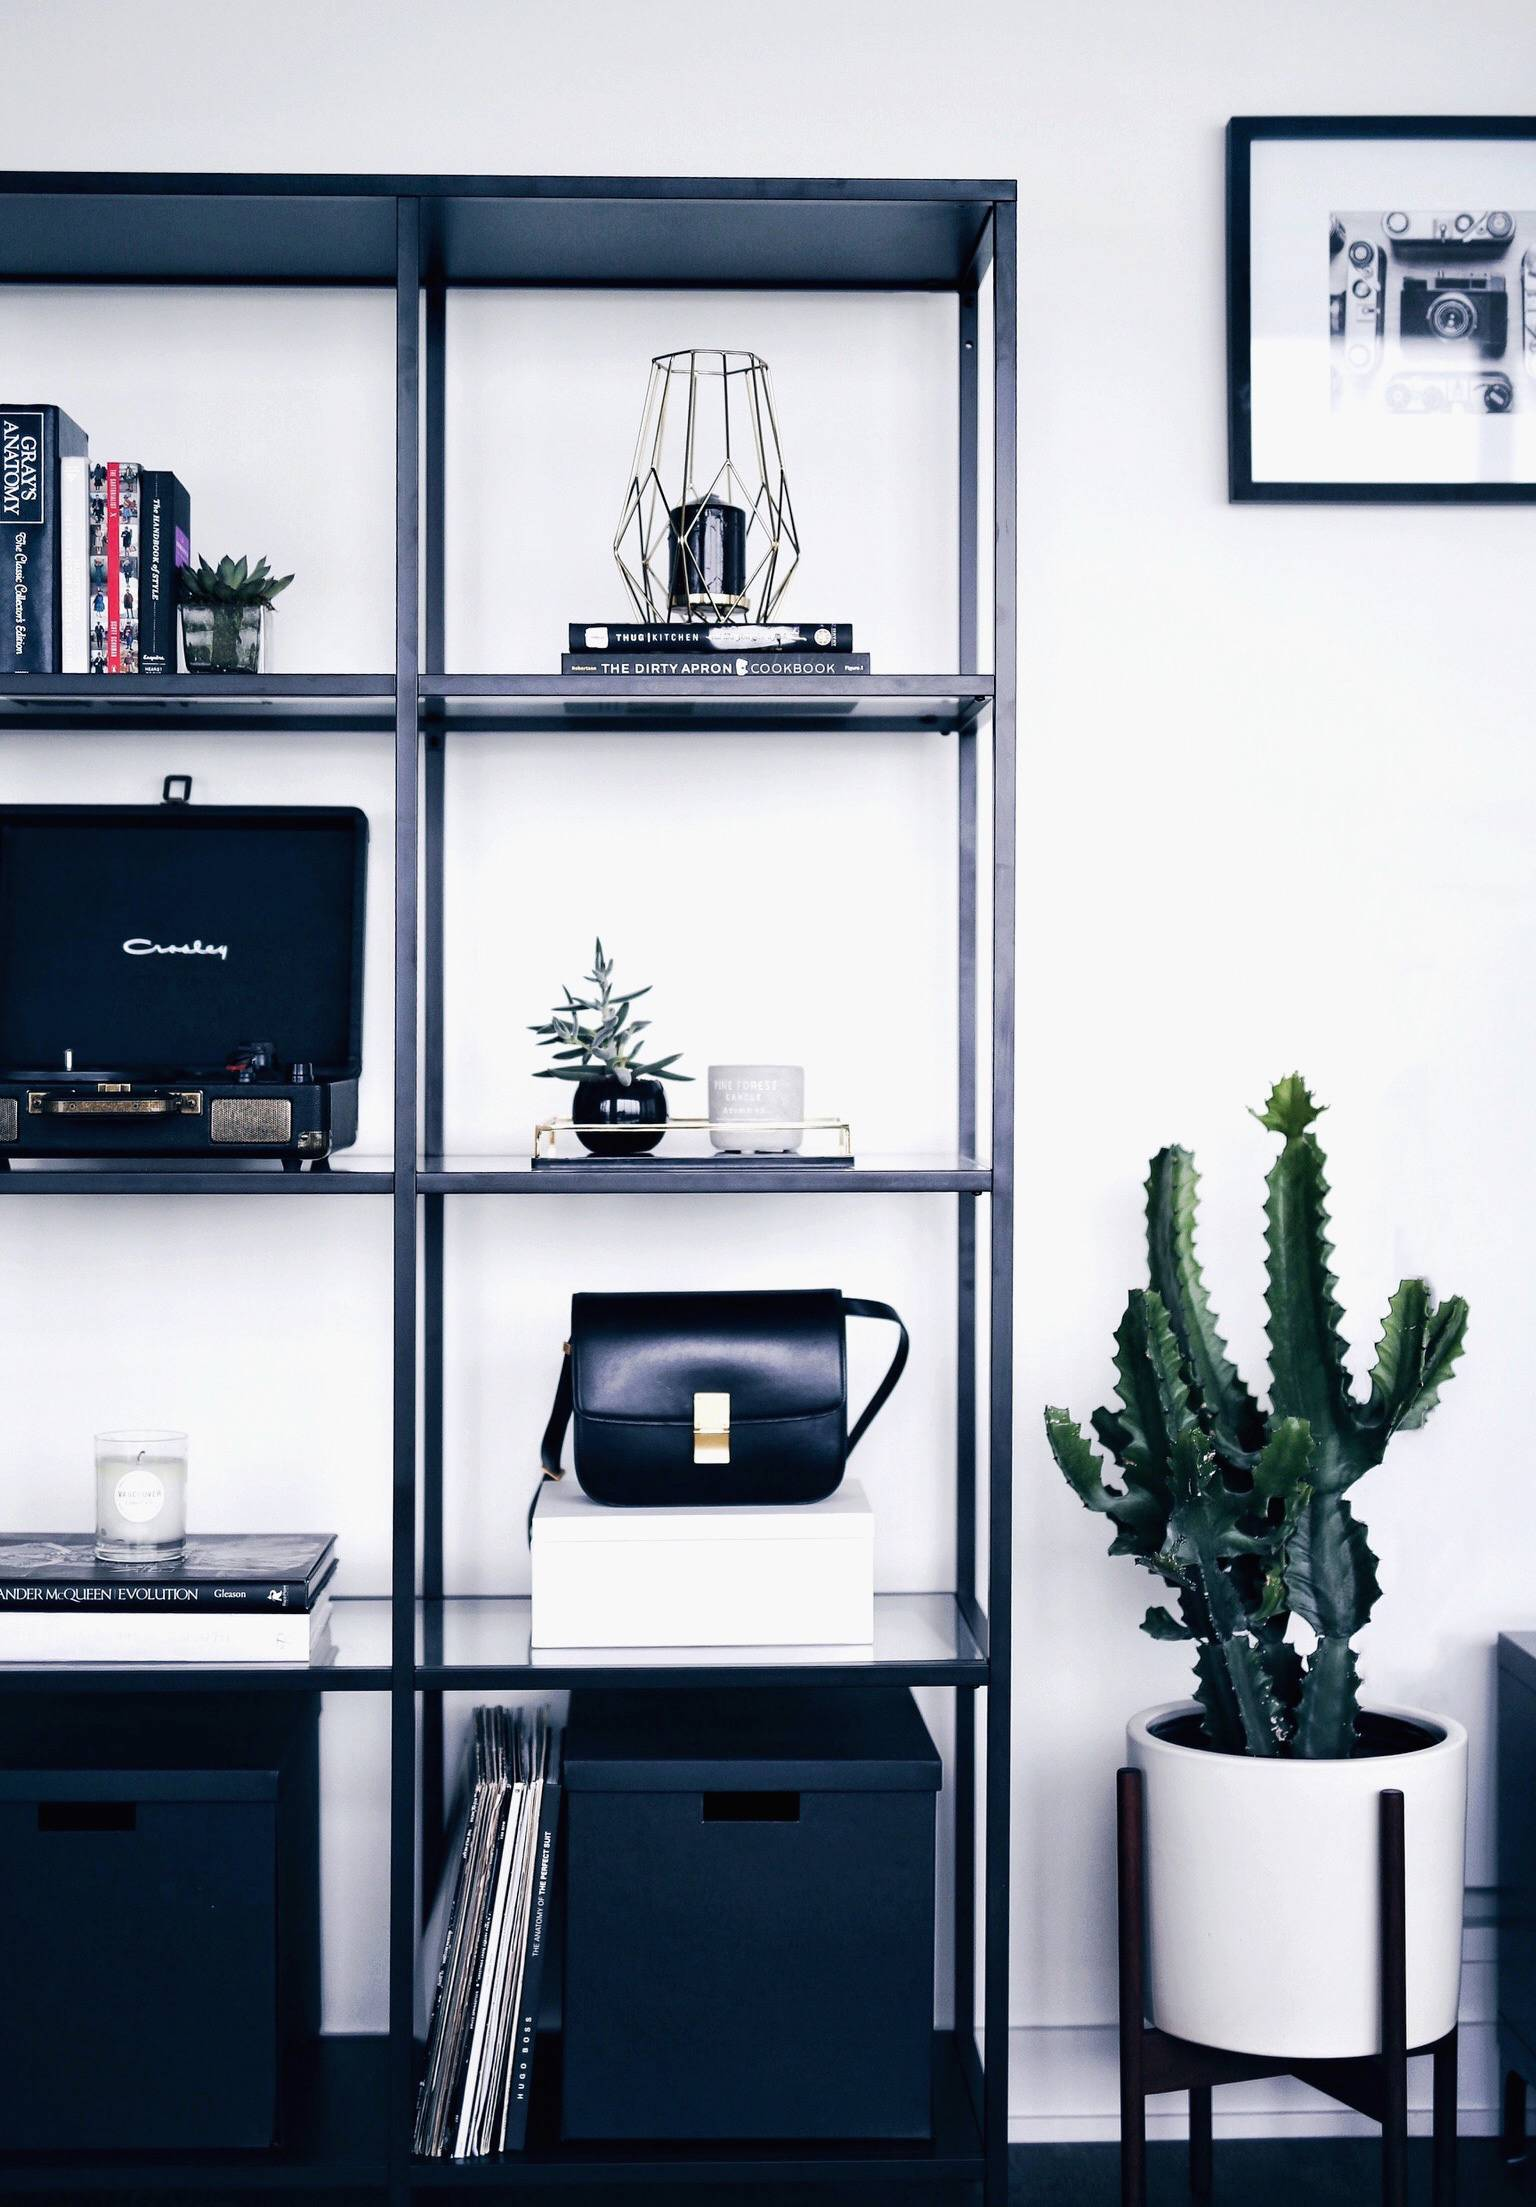 modern and minimalist shelf styling, celine bag